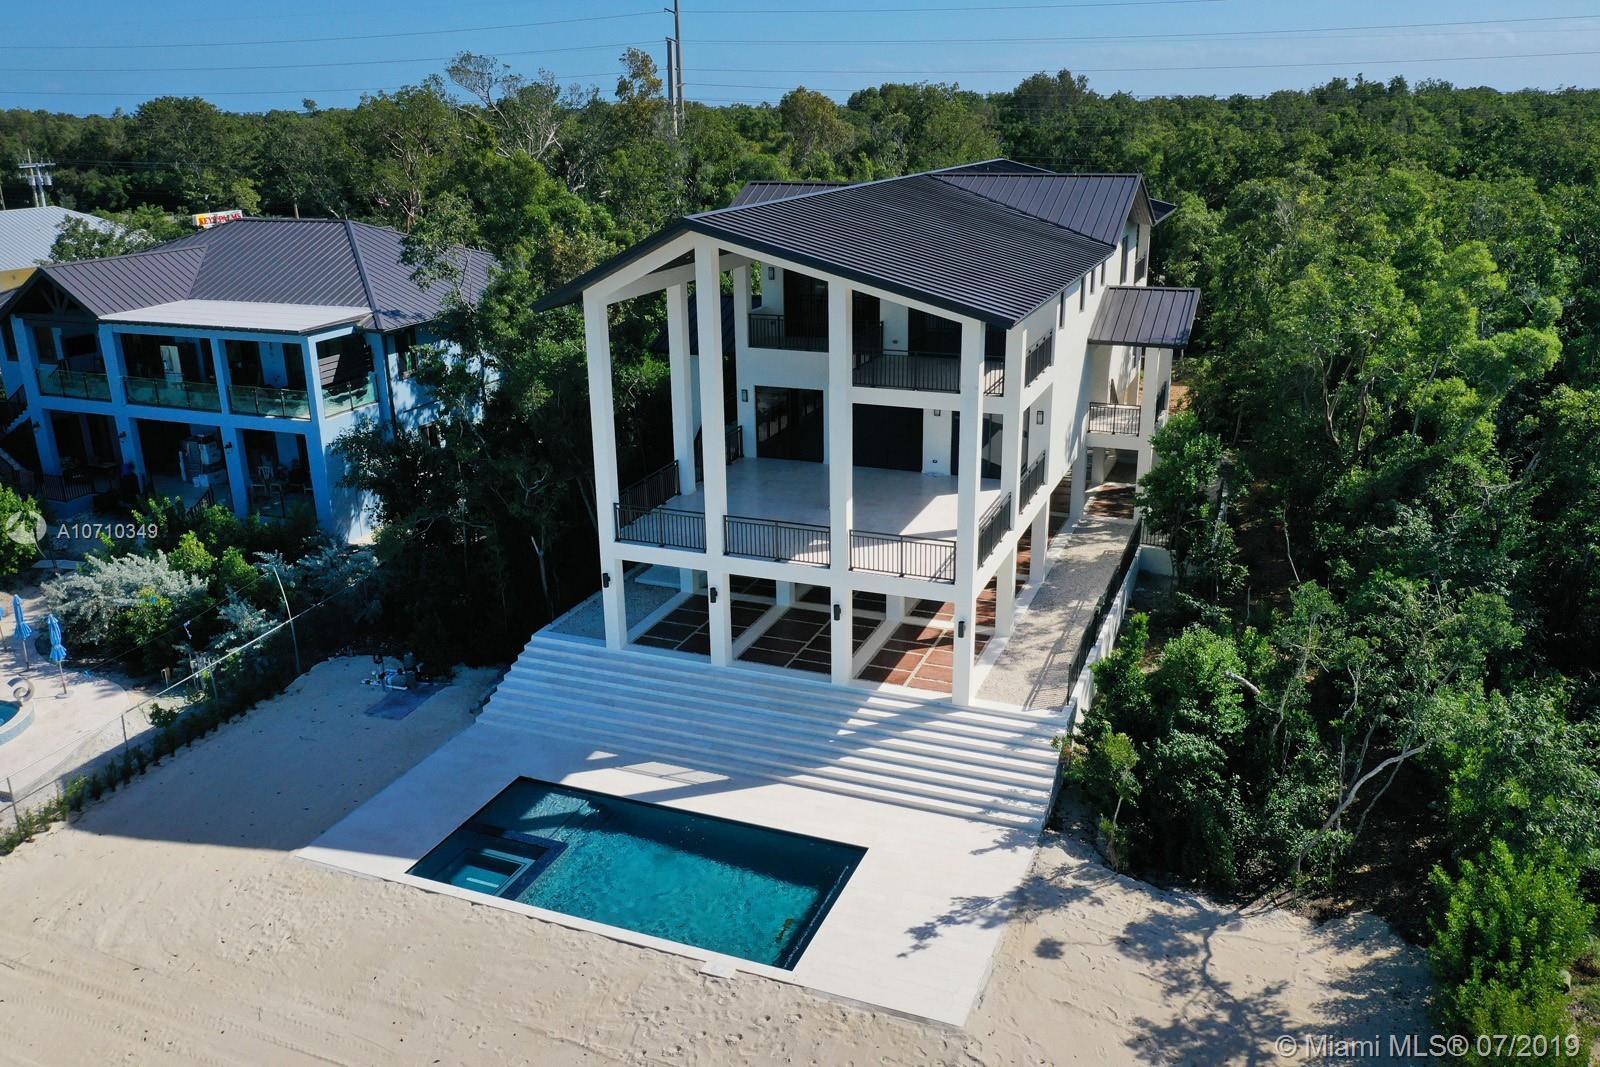 104140 Overseas Highway, Other City - Keys/Islands/Caribb, FL 33037 - Other City - Keys/Islands/Caribb, FL real estate listing